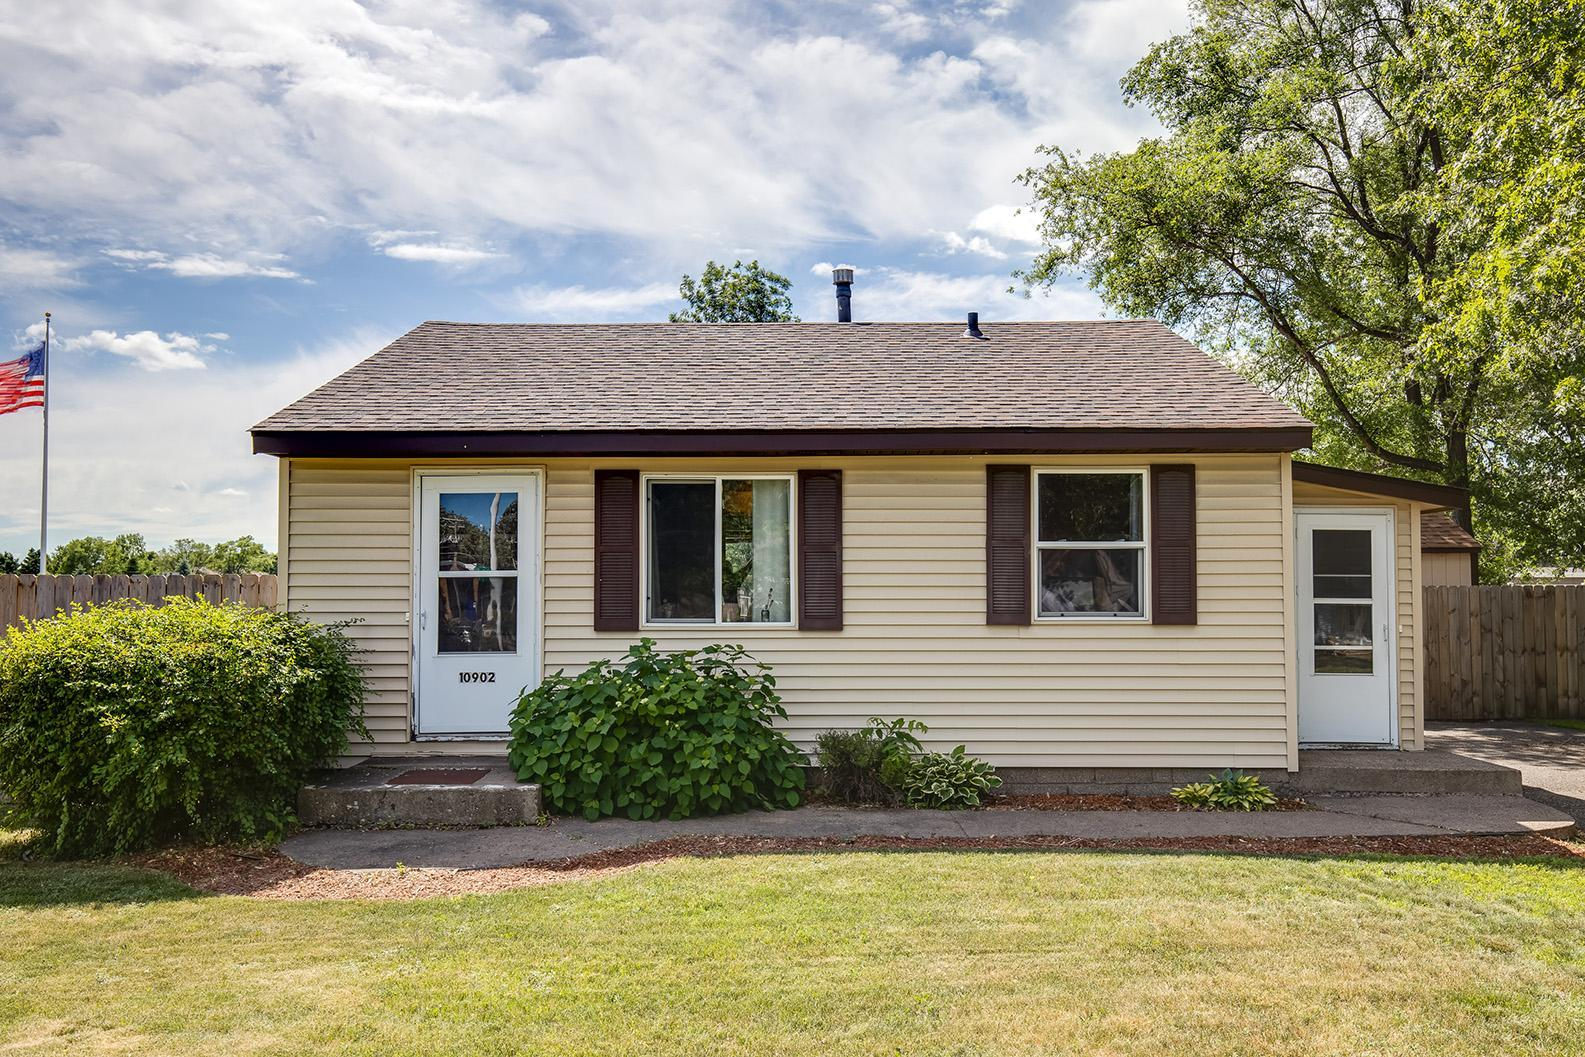 10902 4th Street NE Property Photo - Blaine, MN real estate listing